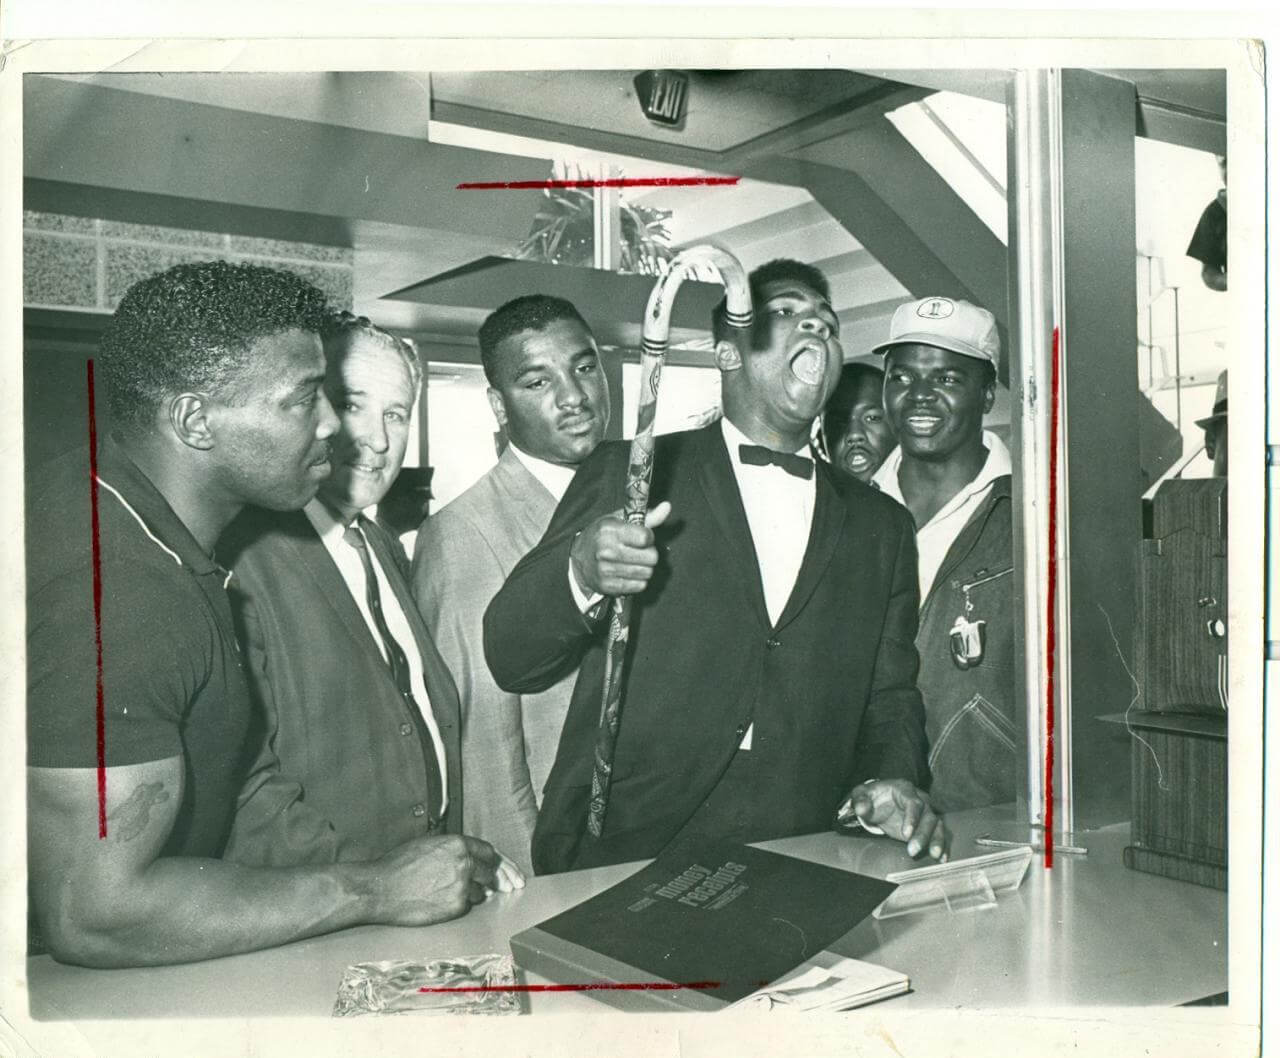 1964 Cassius Clay (aka Muhammad Ali) Vintage B&W 8x10 Photo by Photographer Eli Silverberg (Stamped)